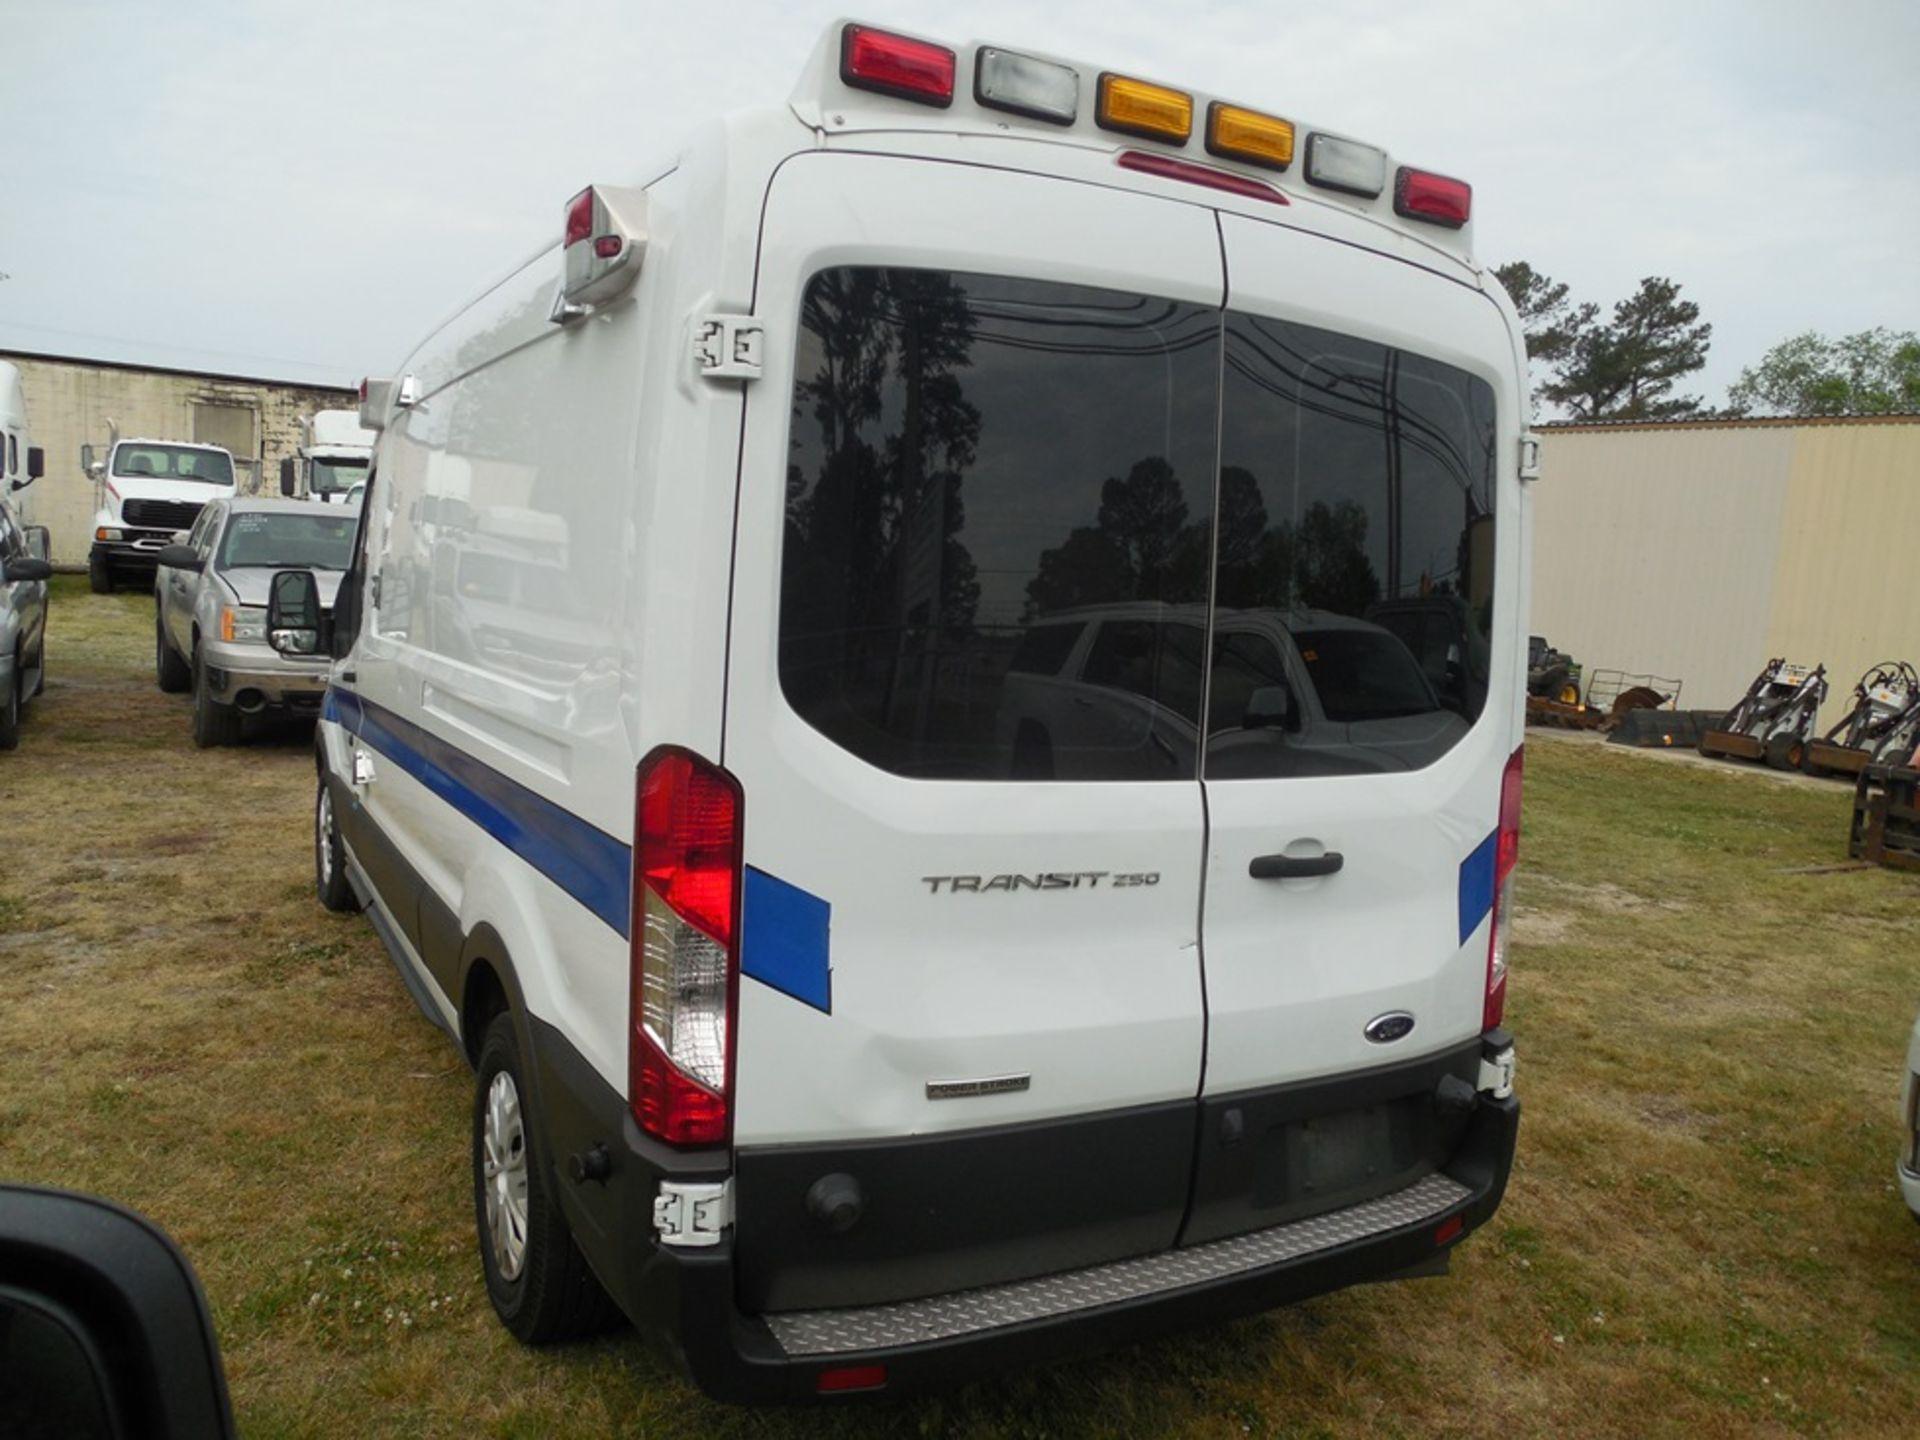 2017 Ford Tansit 250 dsl ambulance 165,029 miles vin# 1FDYR2CV0HKA57712 - Image 5 of 6